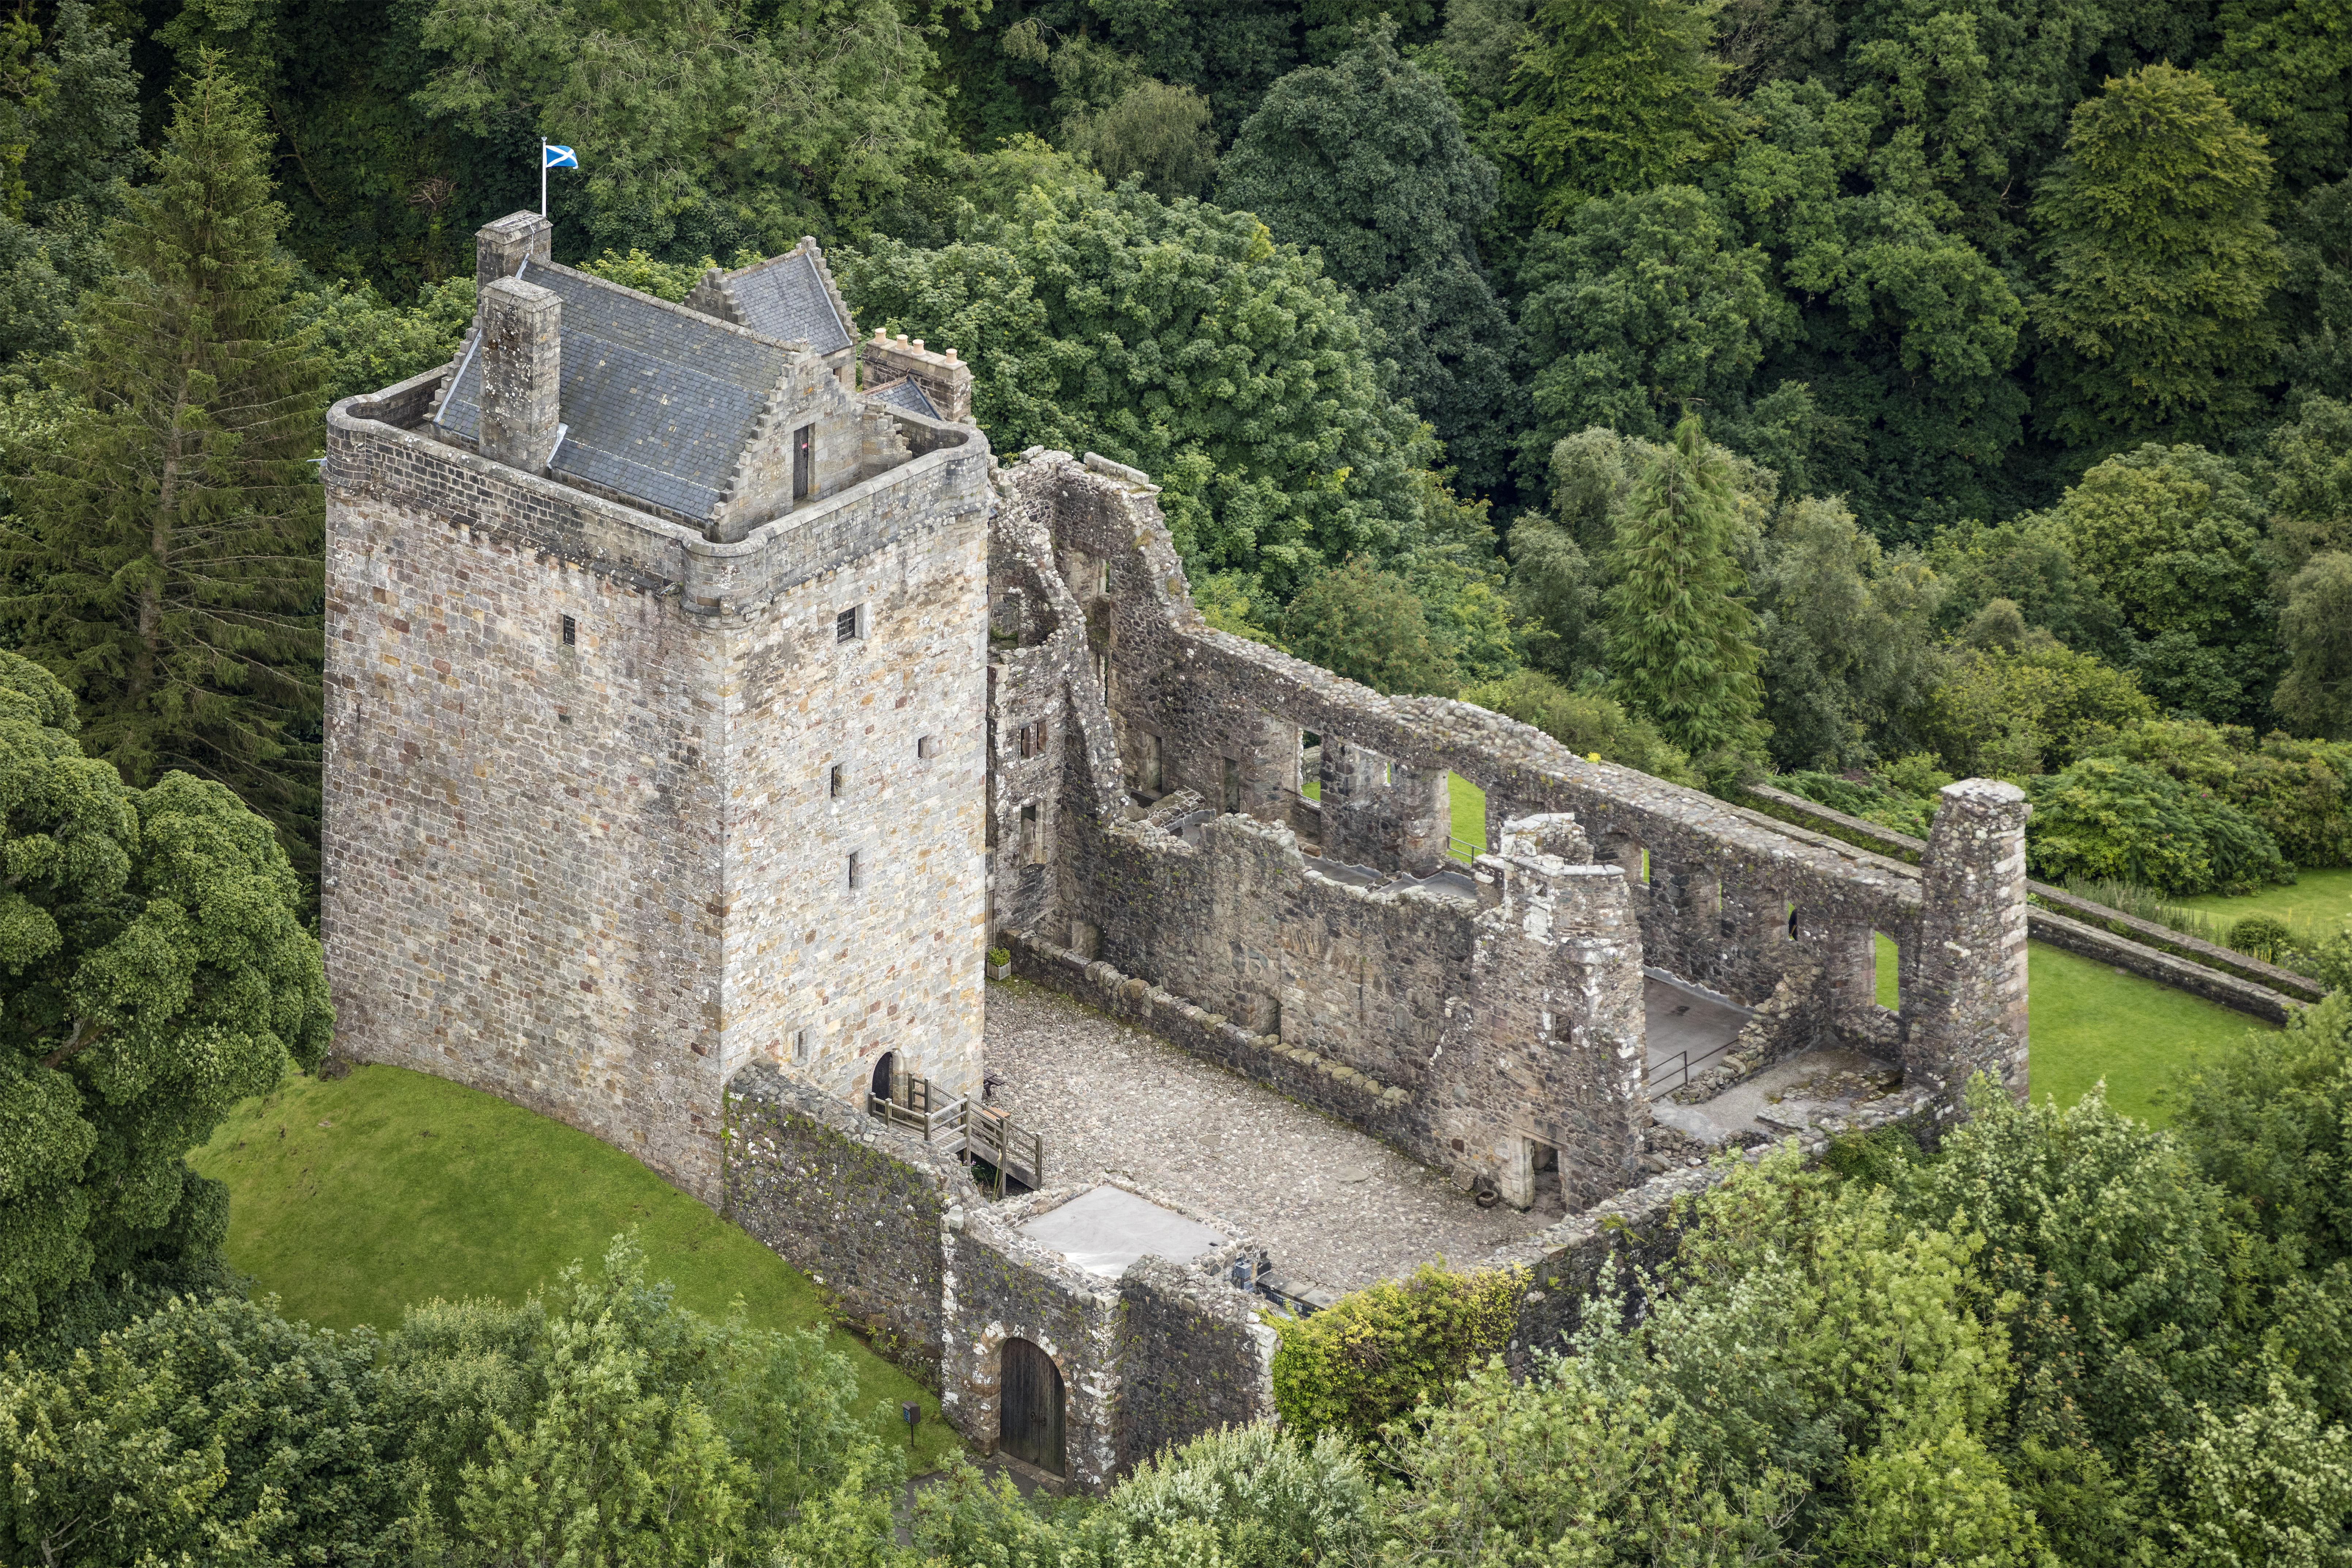 filescotland 2016 aerial dollar castle campbelljpg - Open Castle 2016